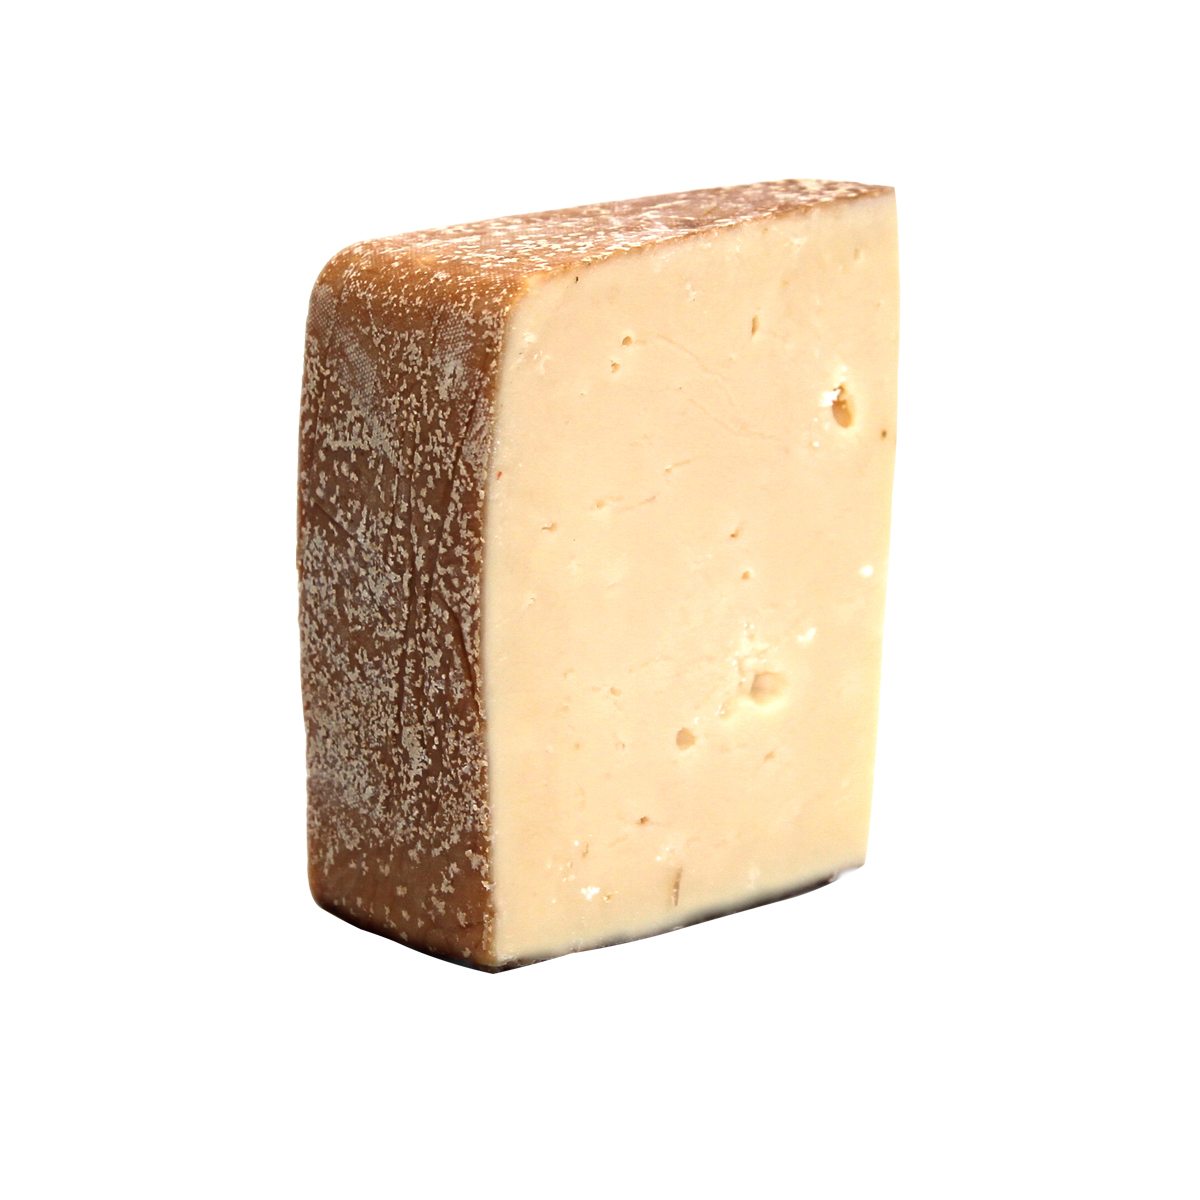 Sartori Bourbon Bellavitano